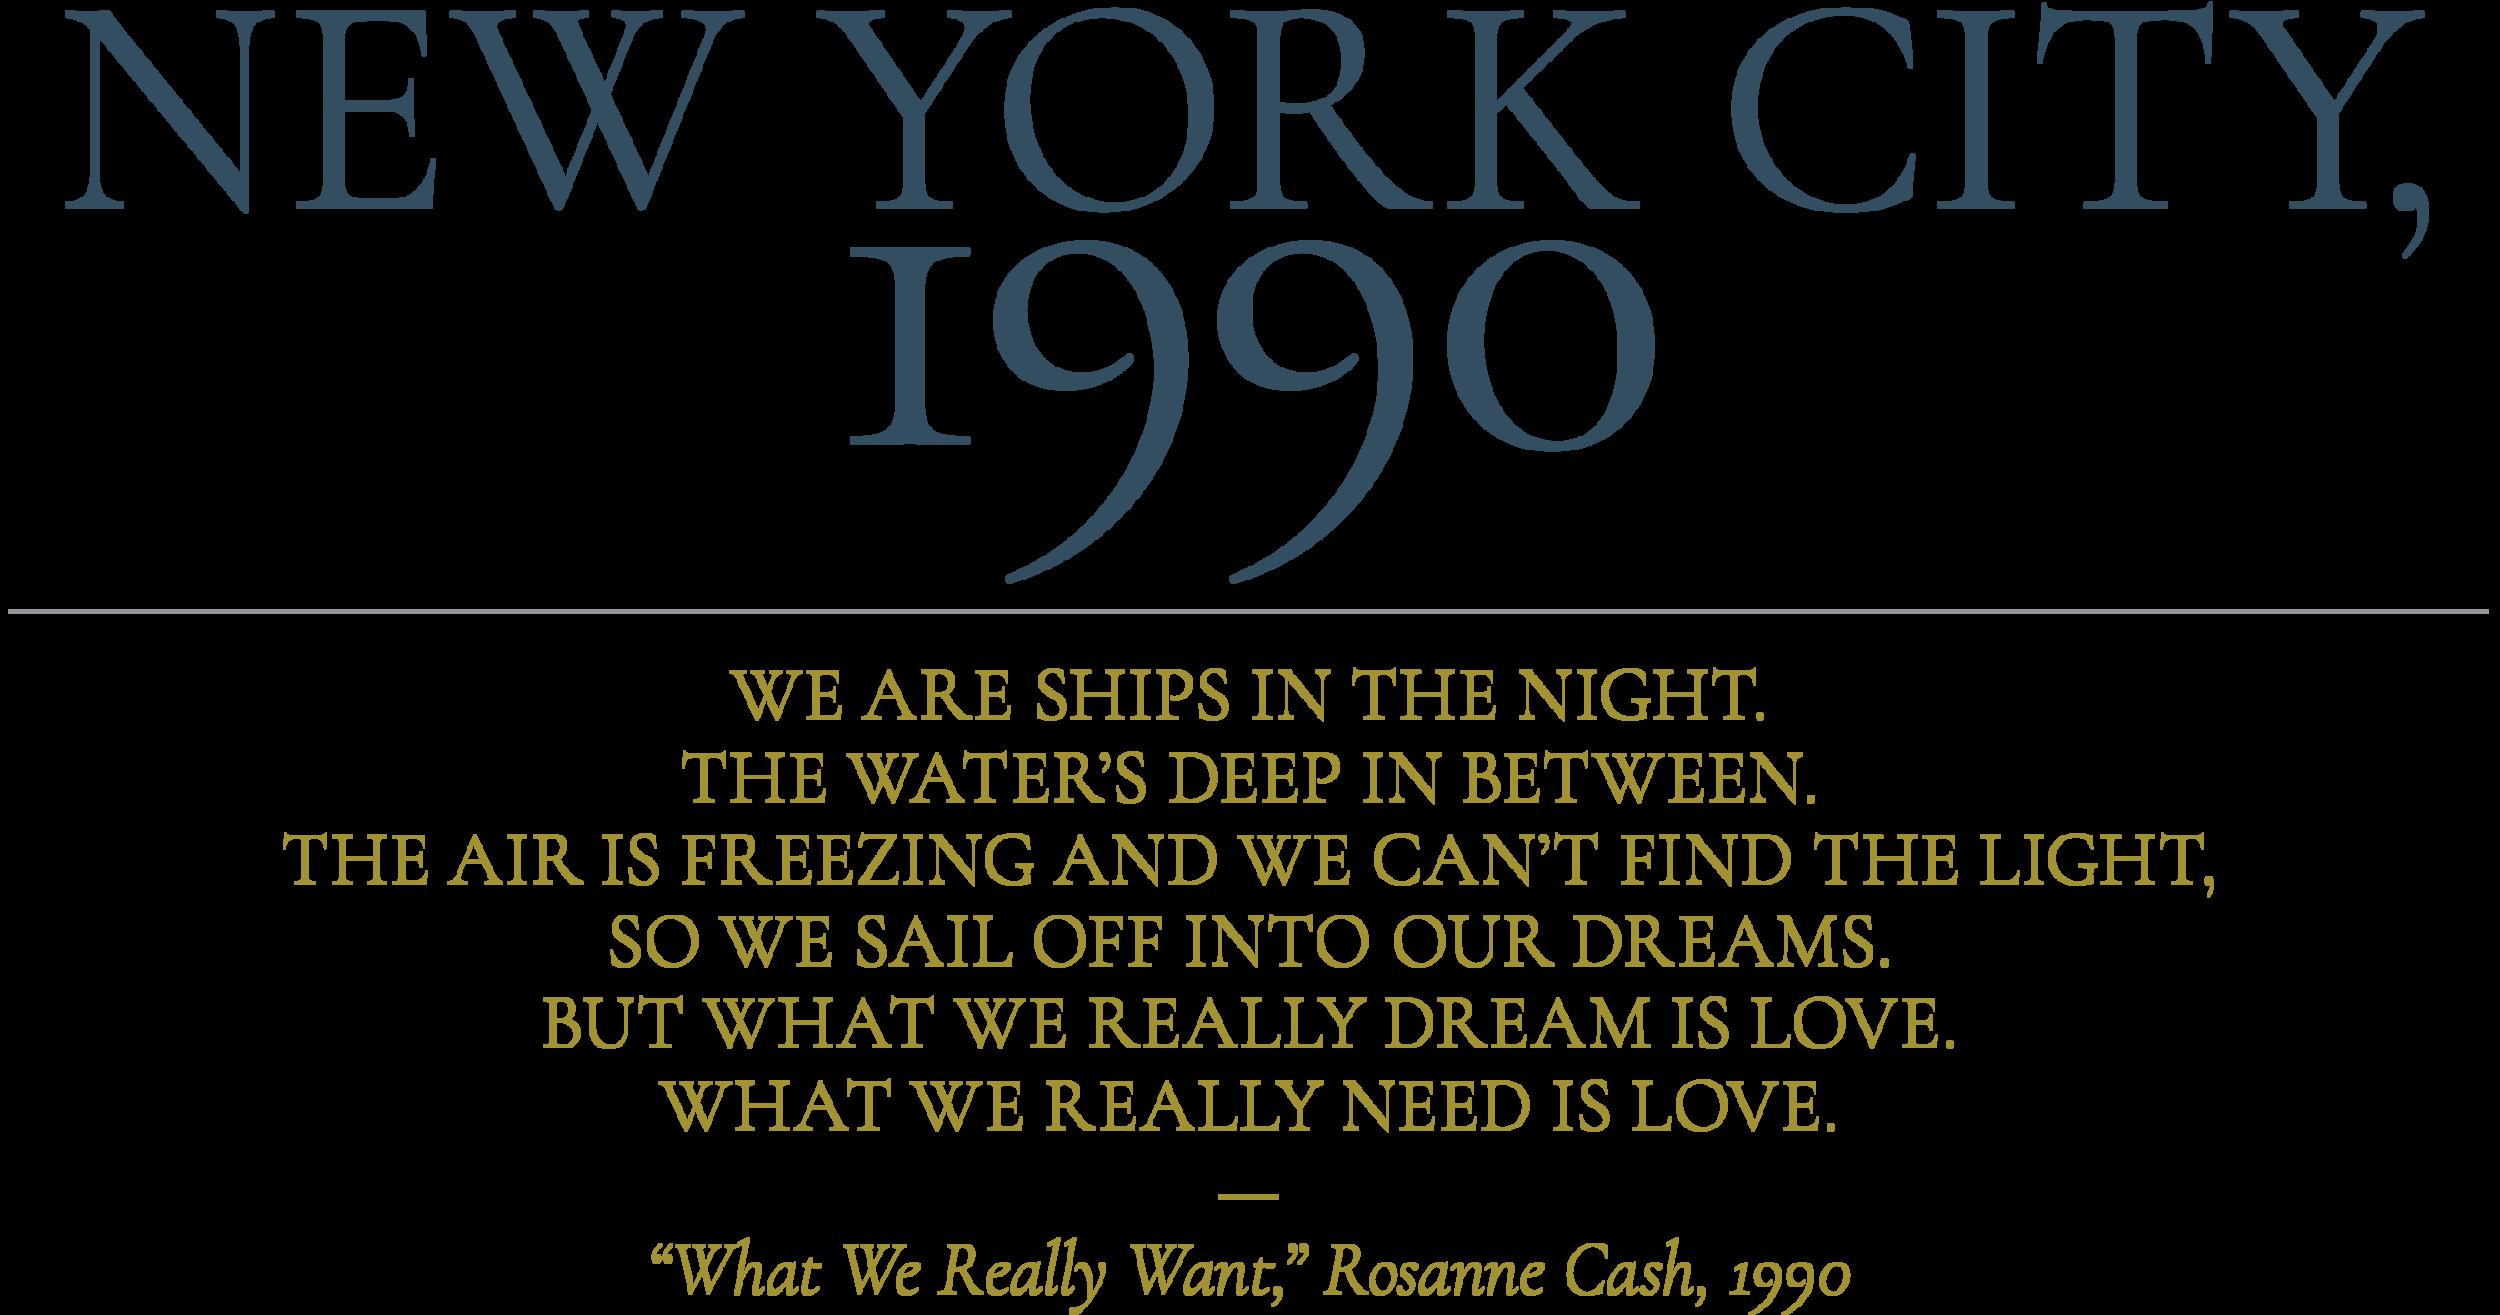 rosanne-cash-new-york-city.png